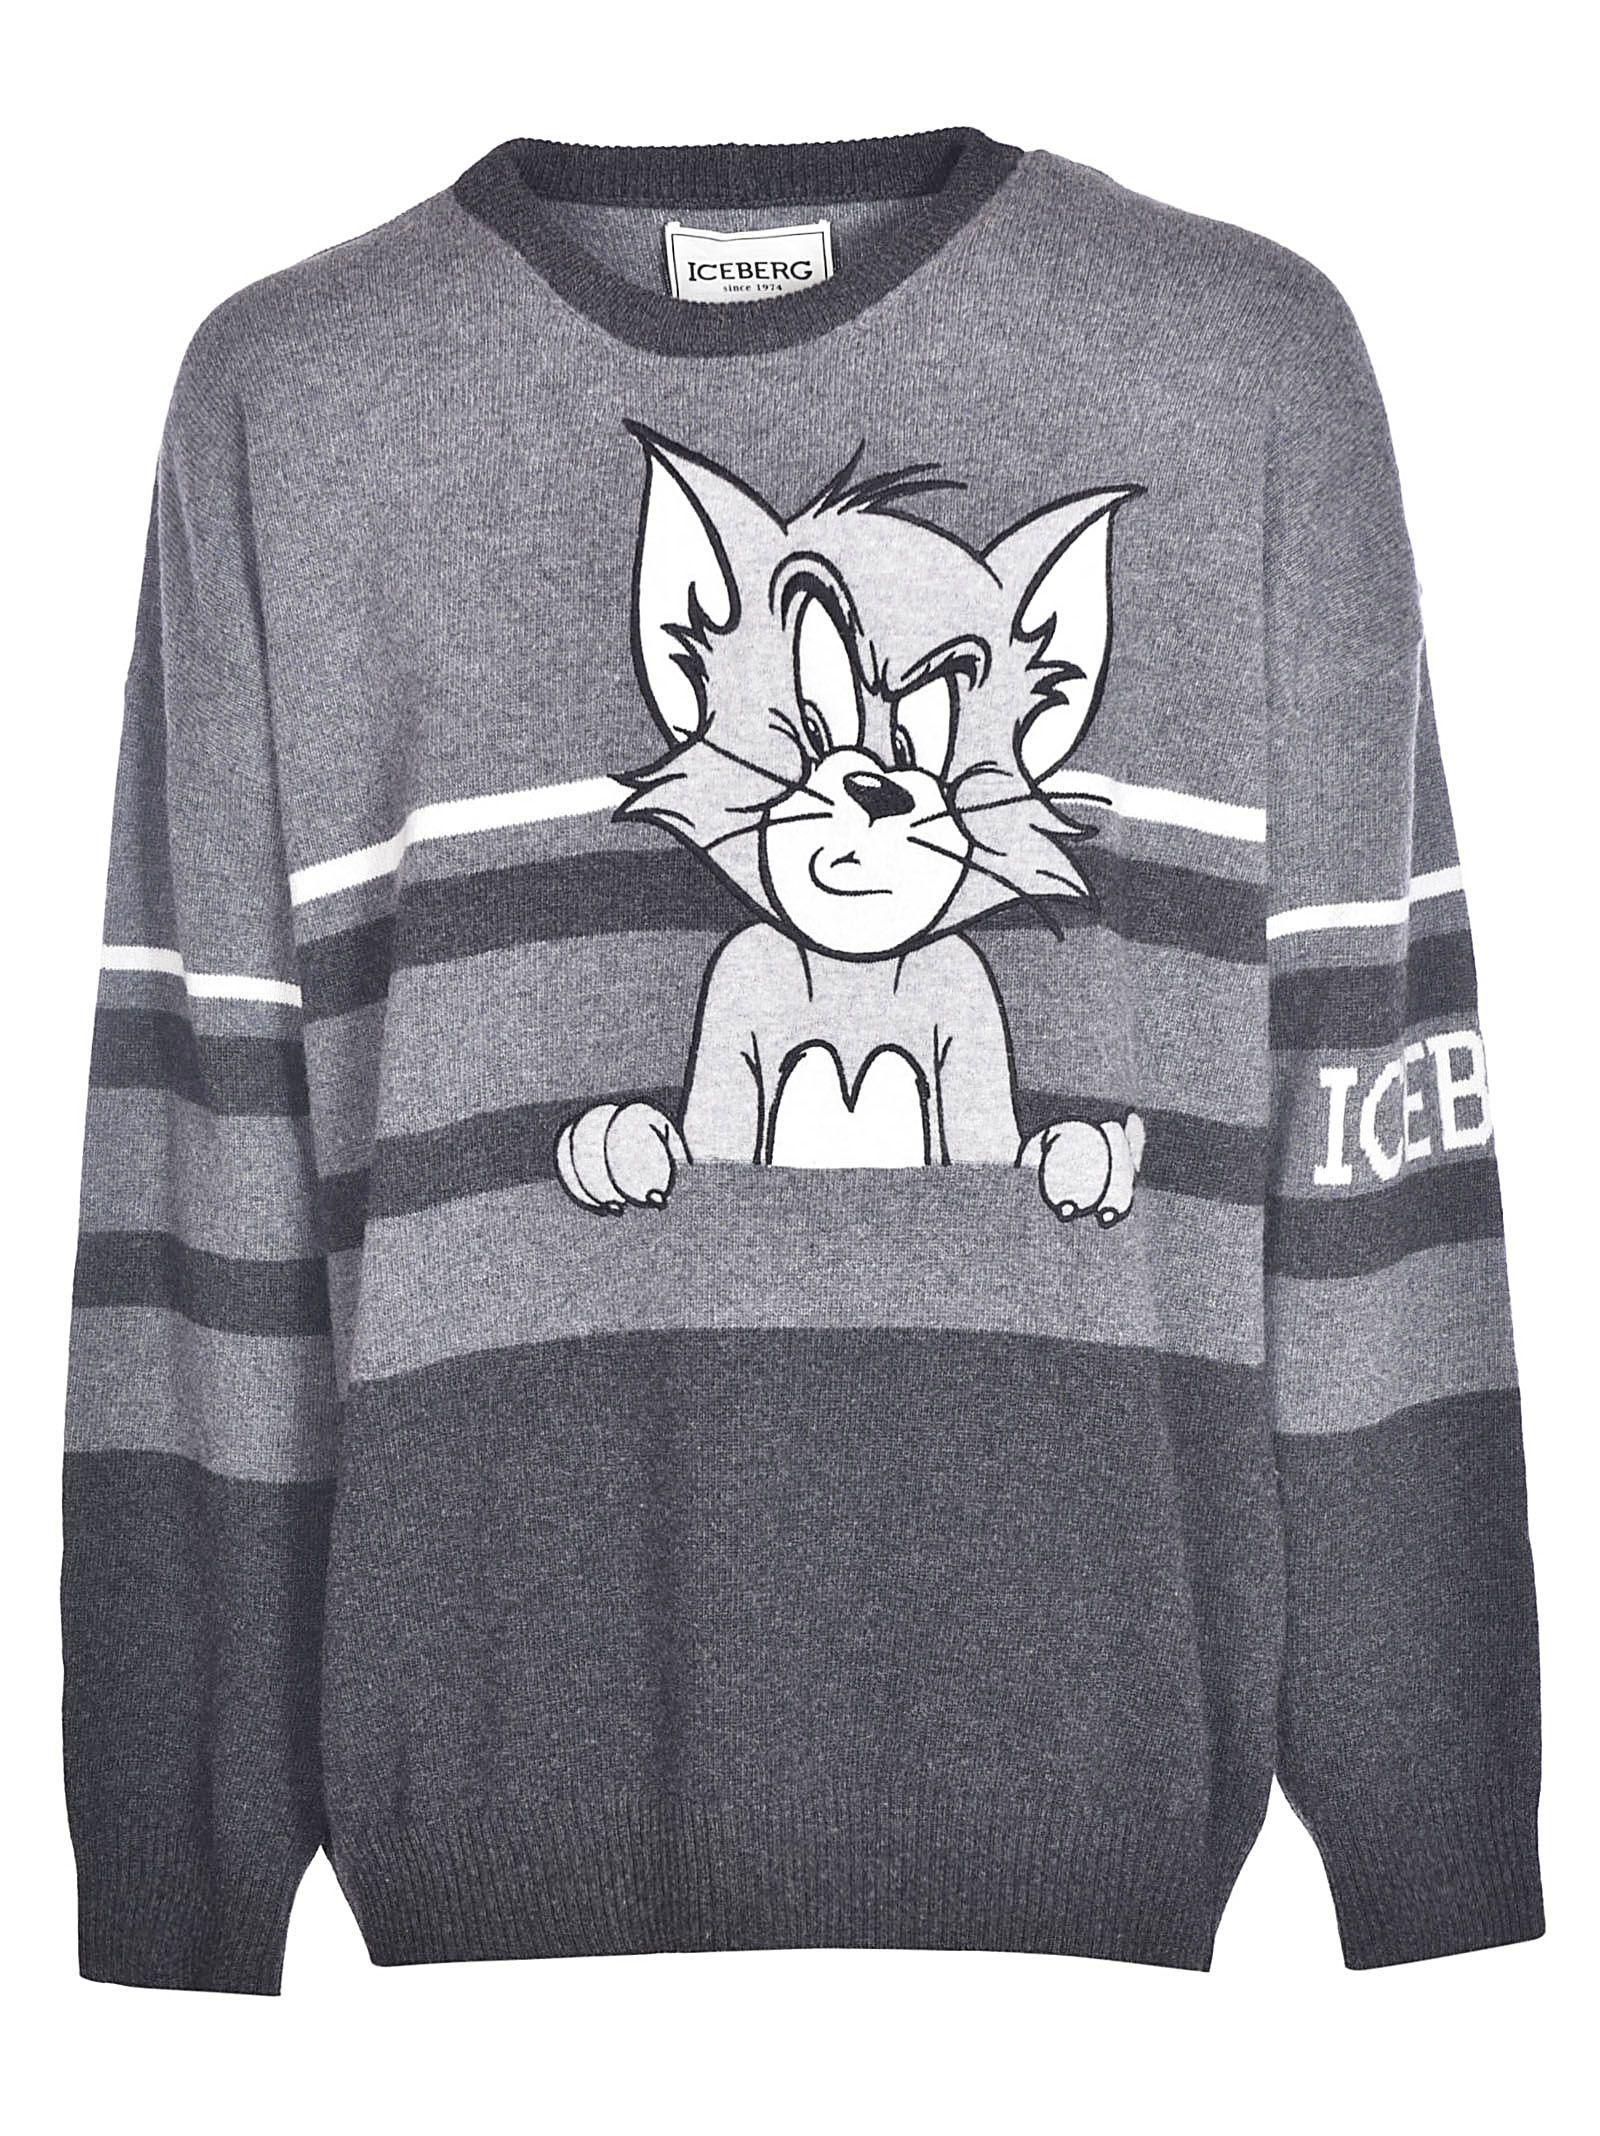 Iceberg Tom Cat Sweater Iceberg Cloth Cat Sweaters Sweaters Mens Sweatshirts [ 2136 x 1600 Pixel ]